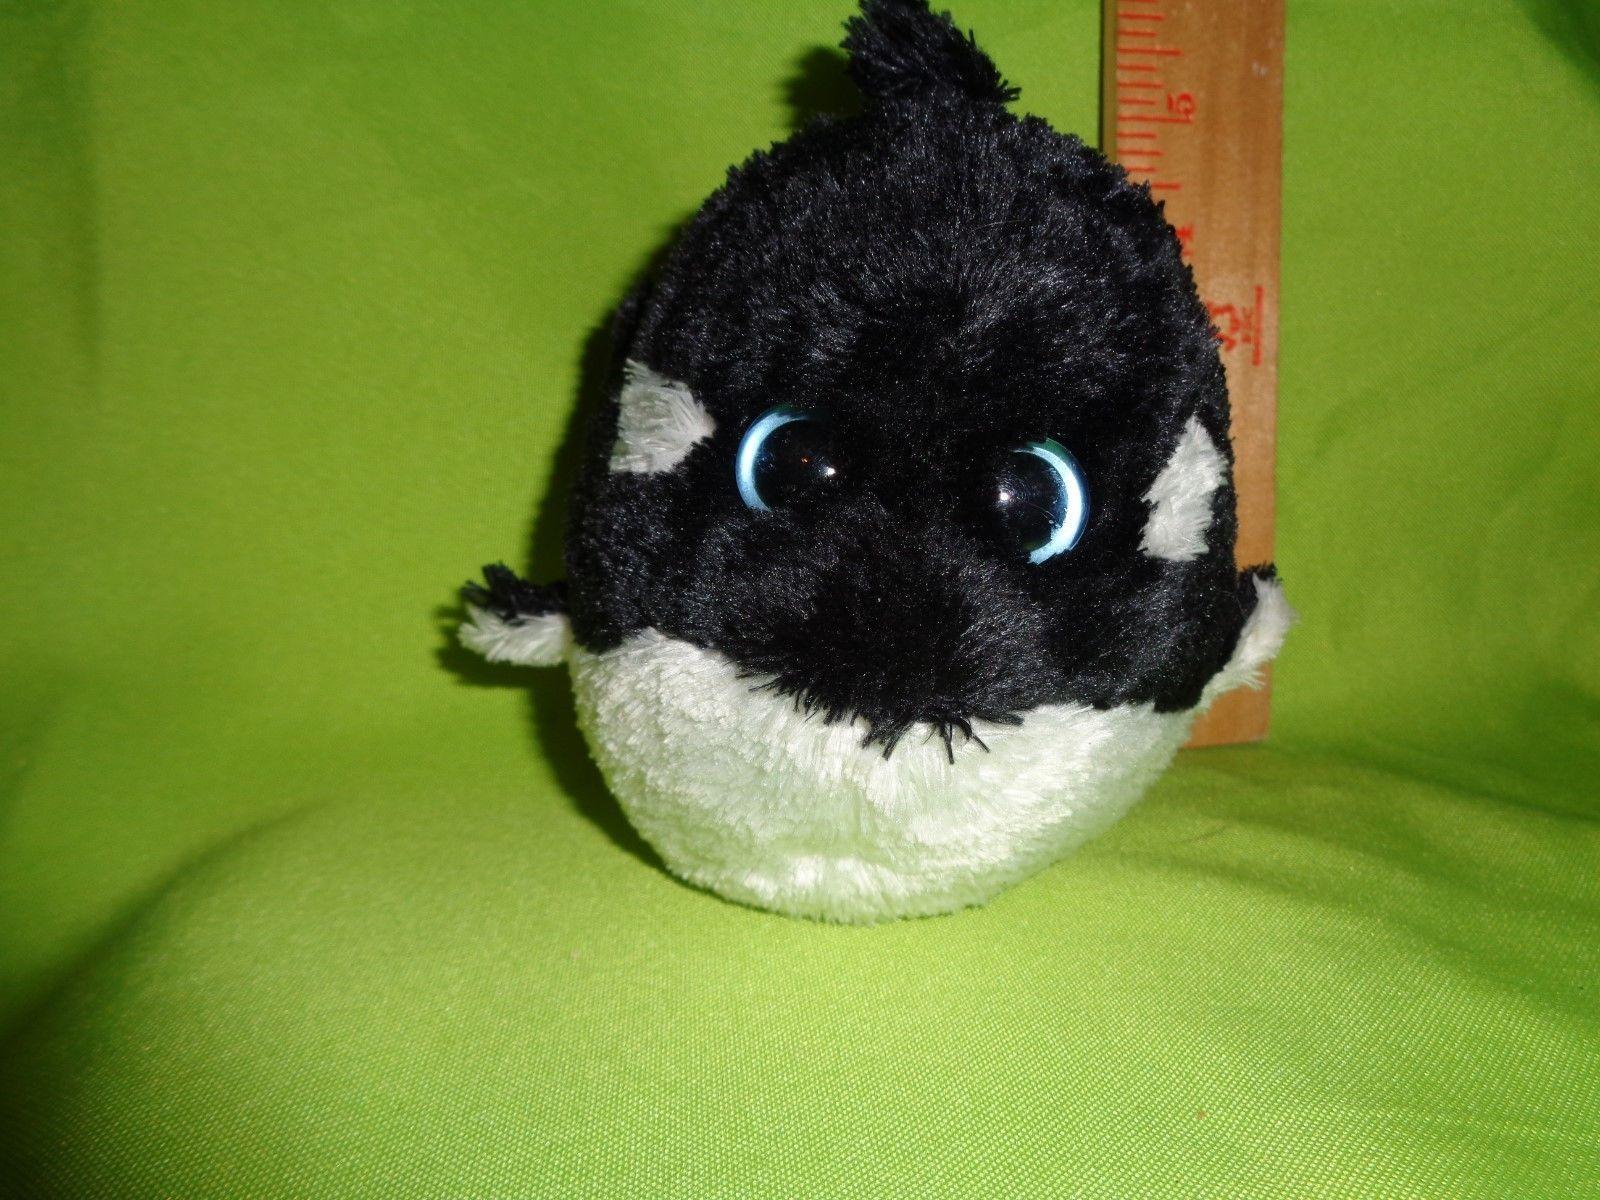 TY Beanie Boo Splash The Whale Plush Stuffed and 18 similar items. S l1600 5905369c30c8